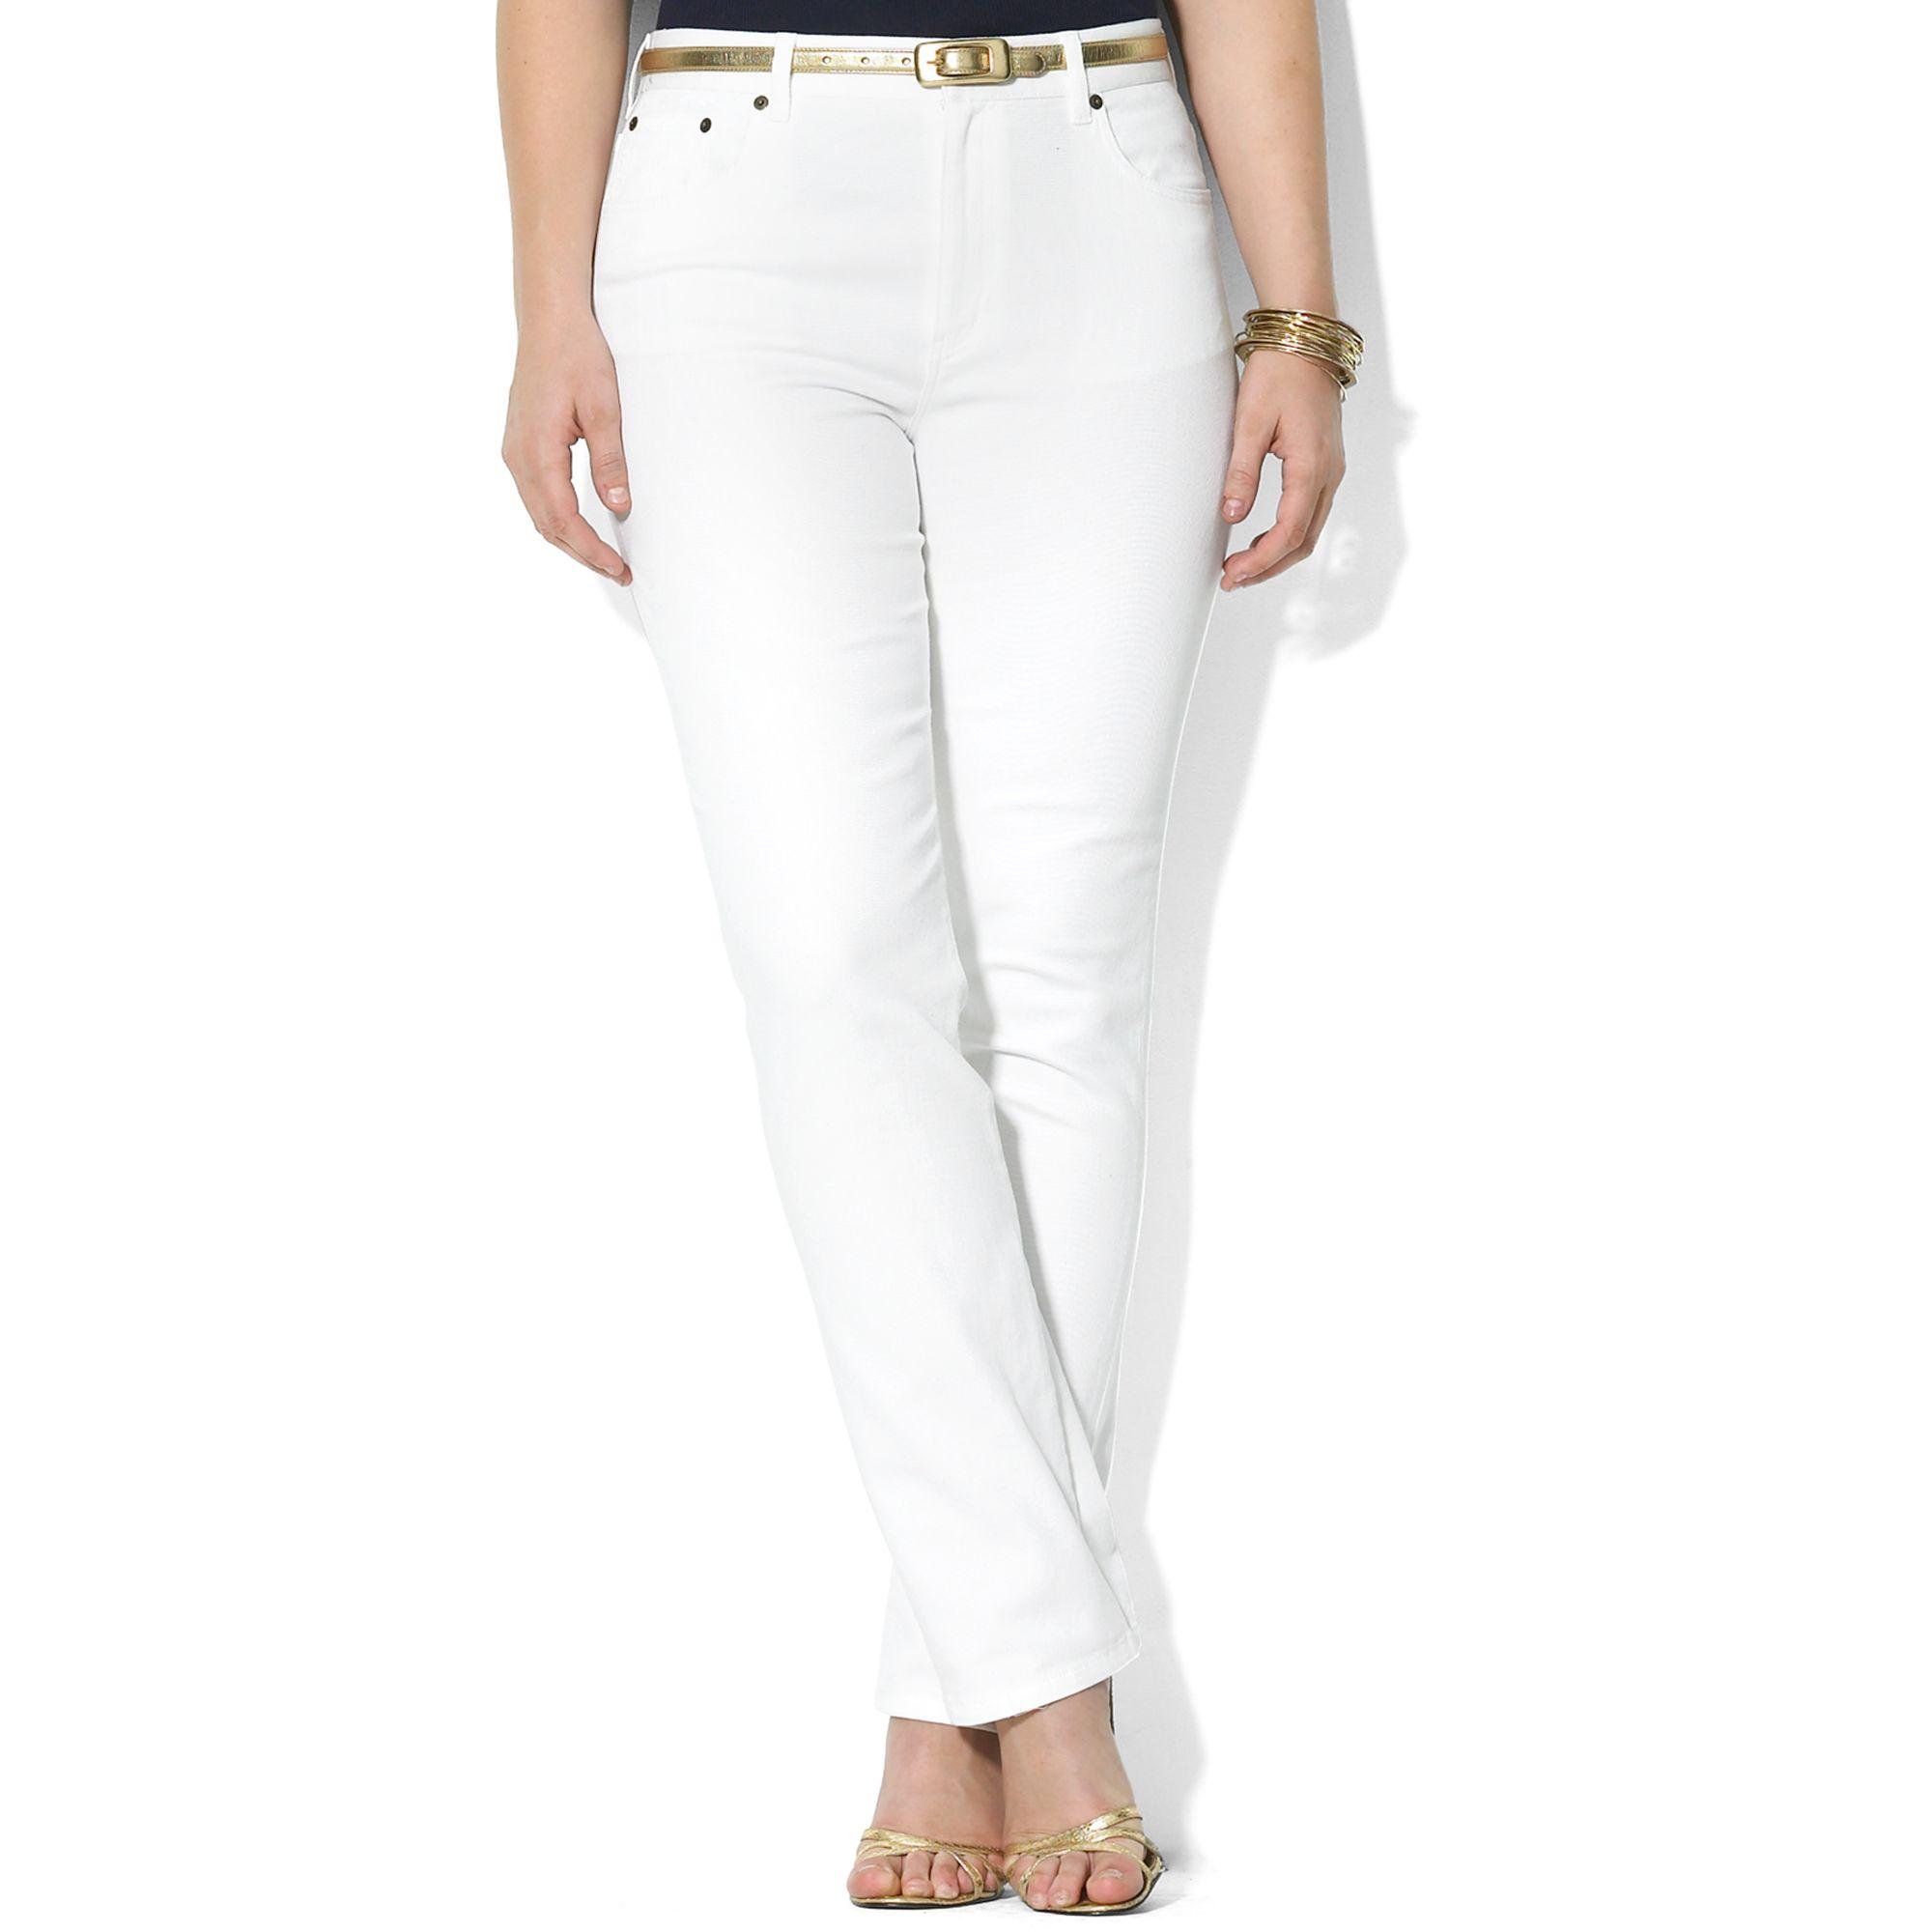 Plus Size White Bootcut Jeans - Jeans Am